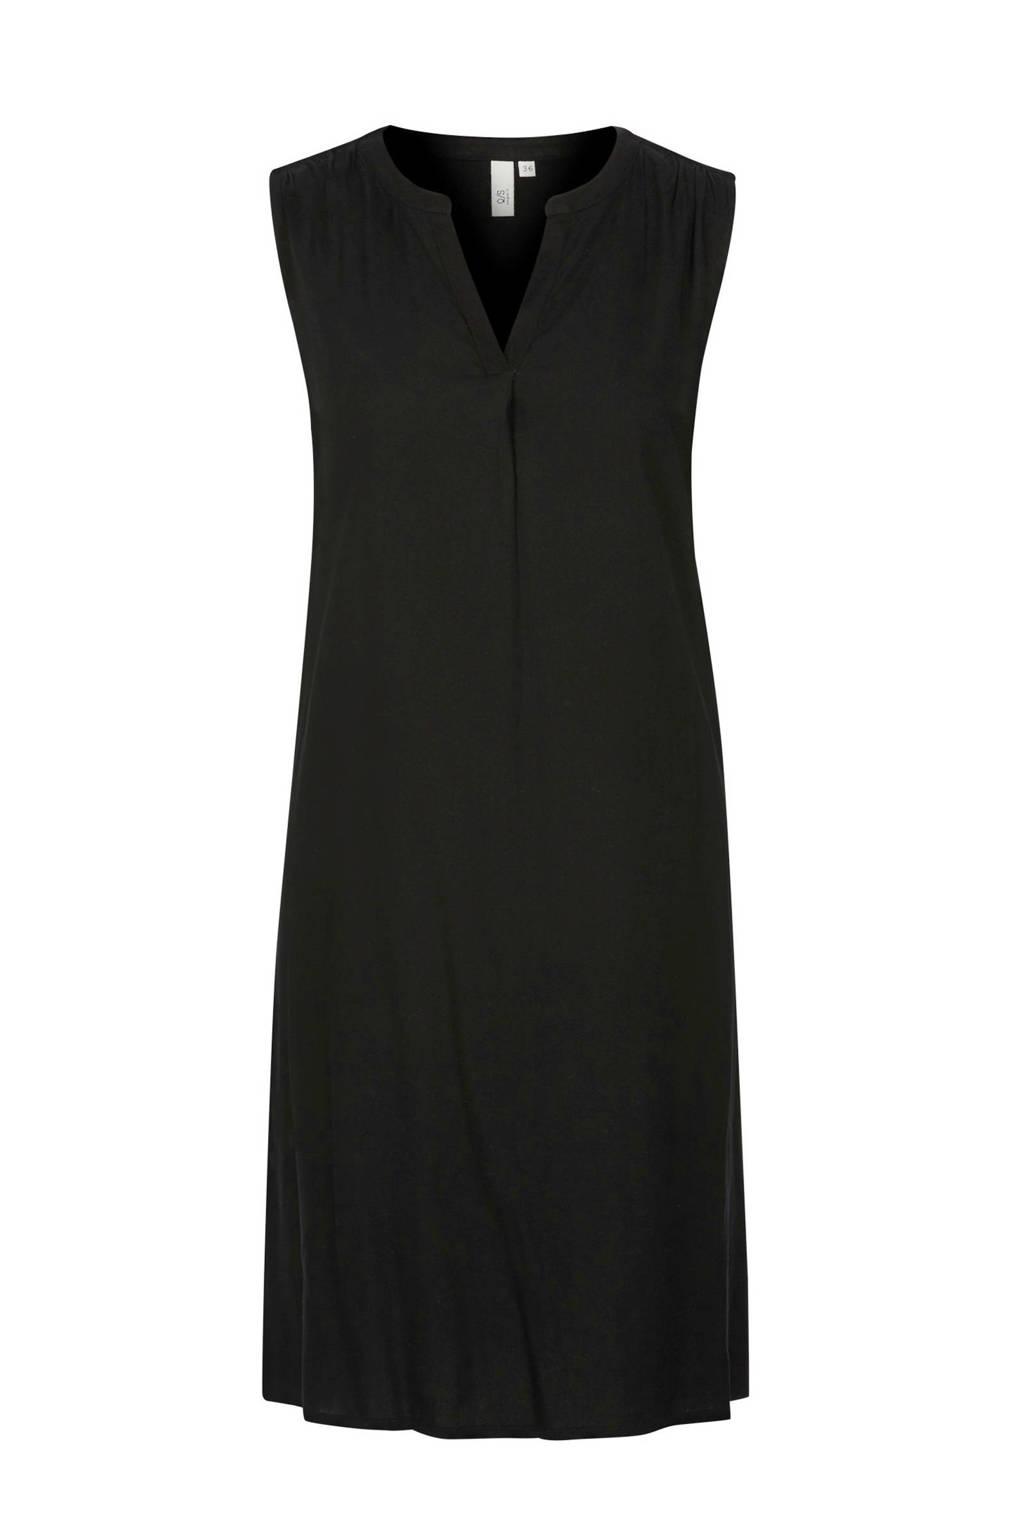 Q/S designed by jersey jurk met plooien zwart, Zwart